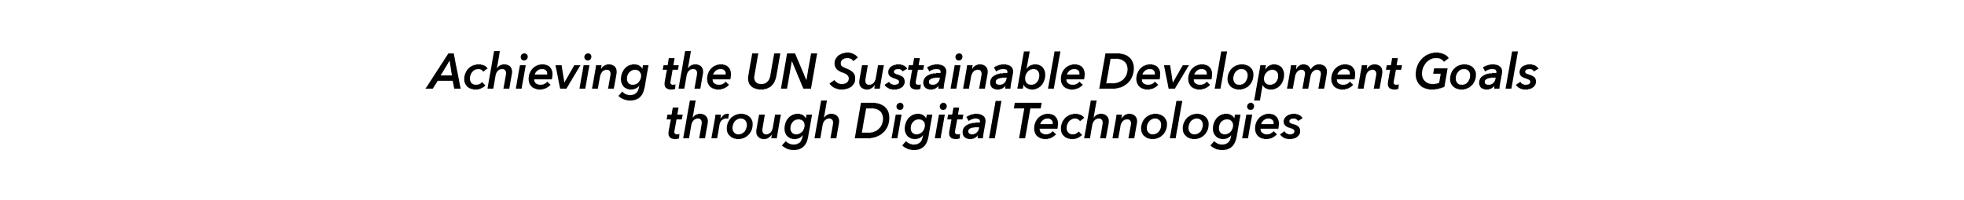 Achieving the UN Sustainable Development Goals through Digital Technologies